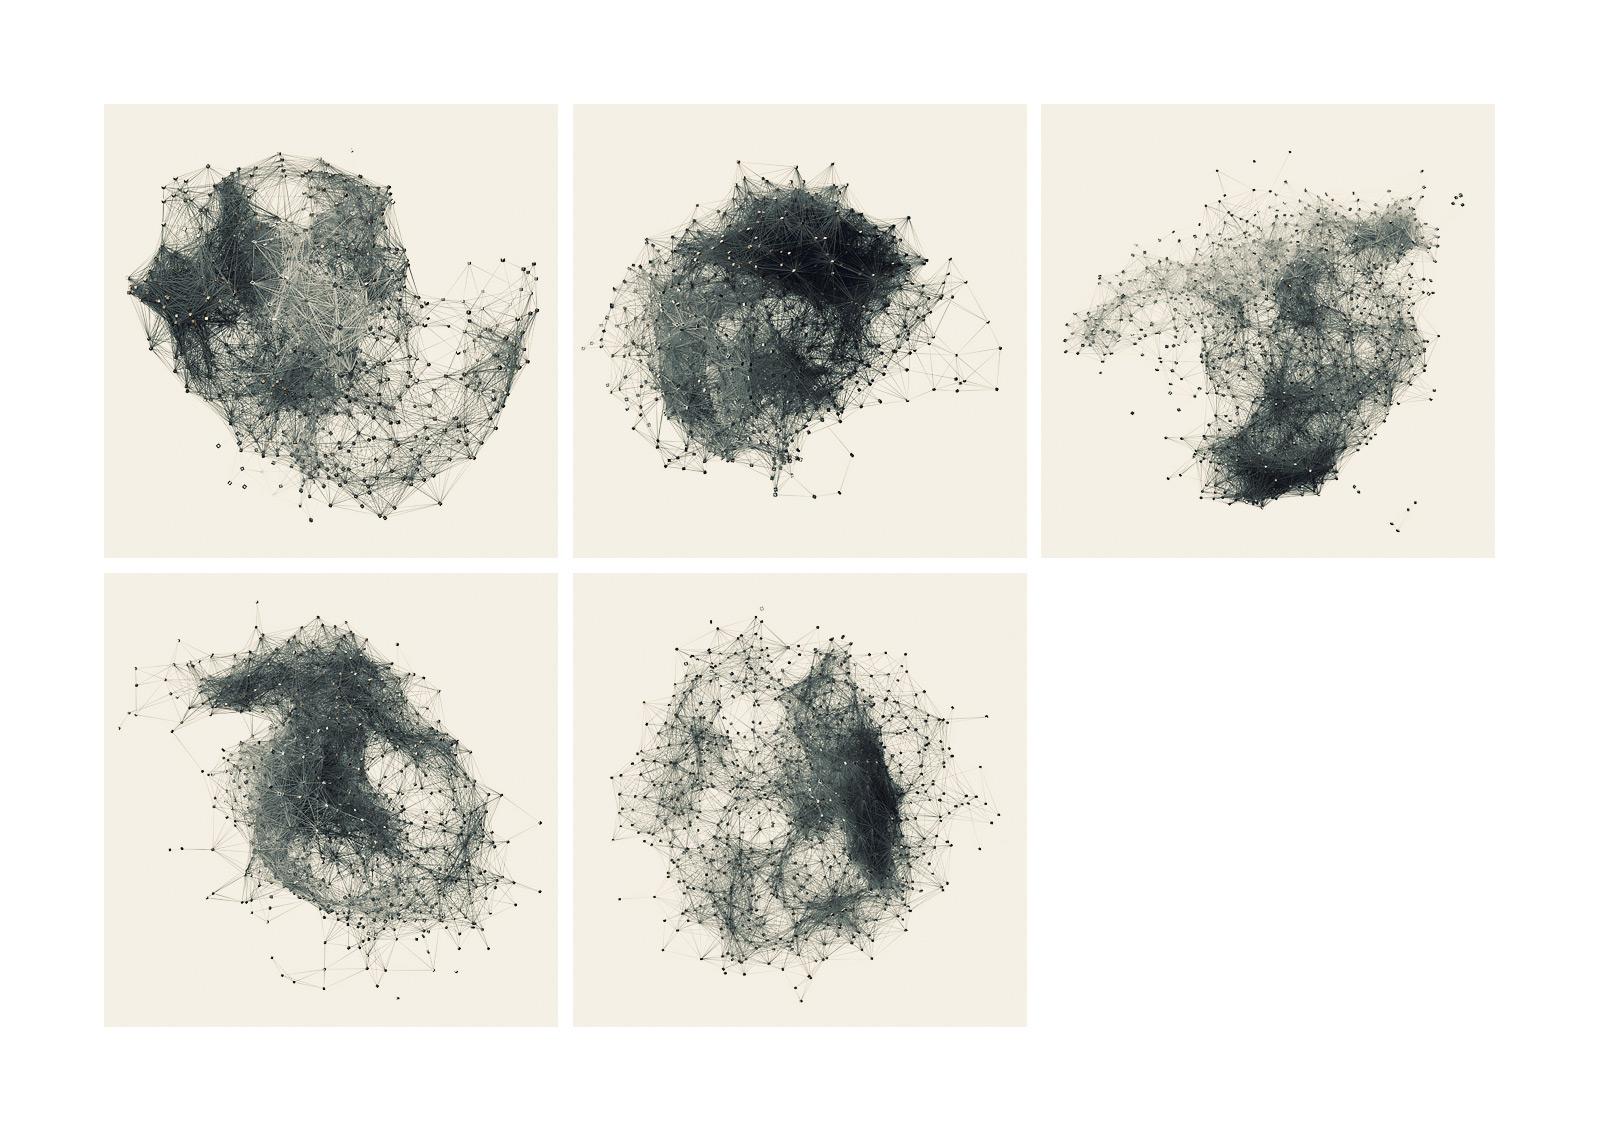 cluster-no1_002.jpg